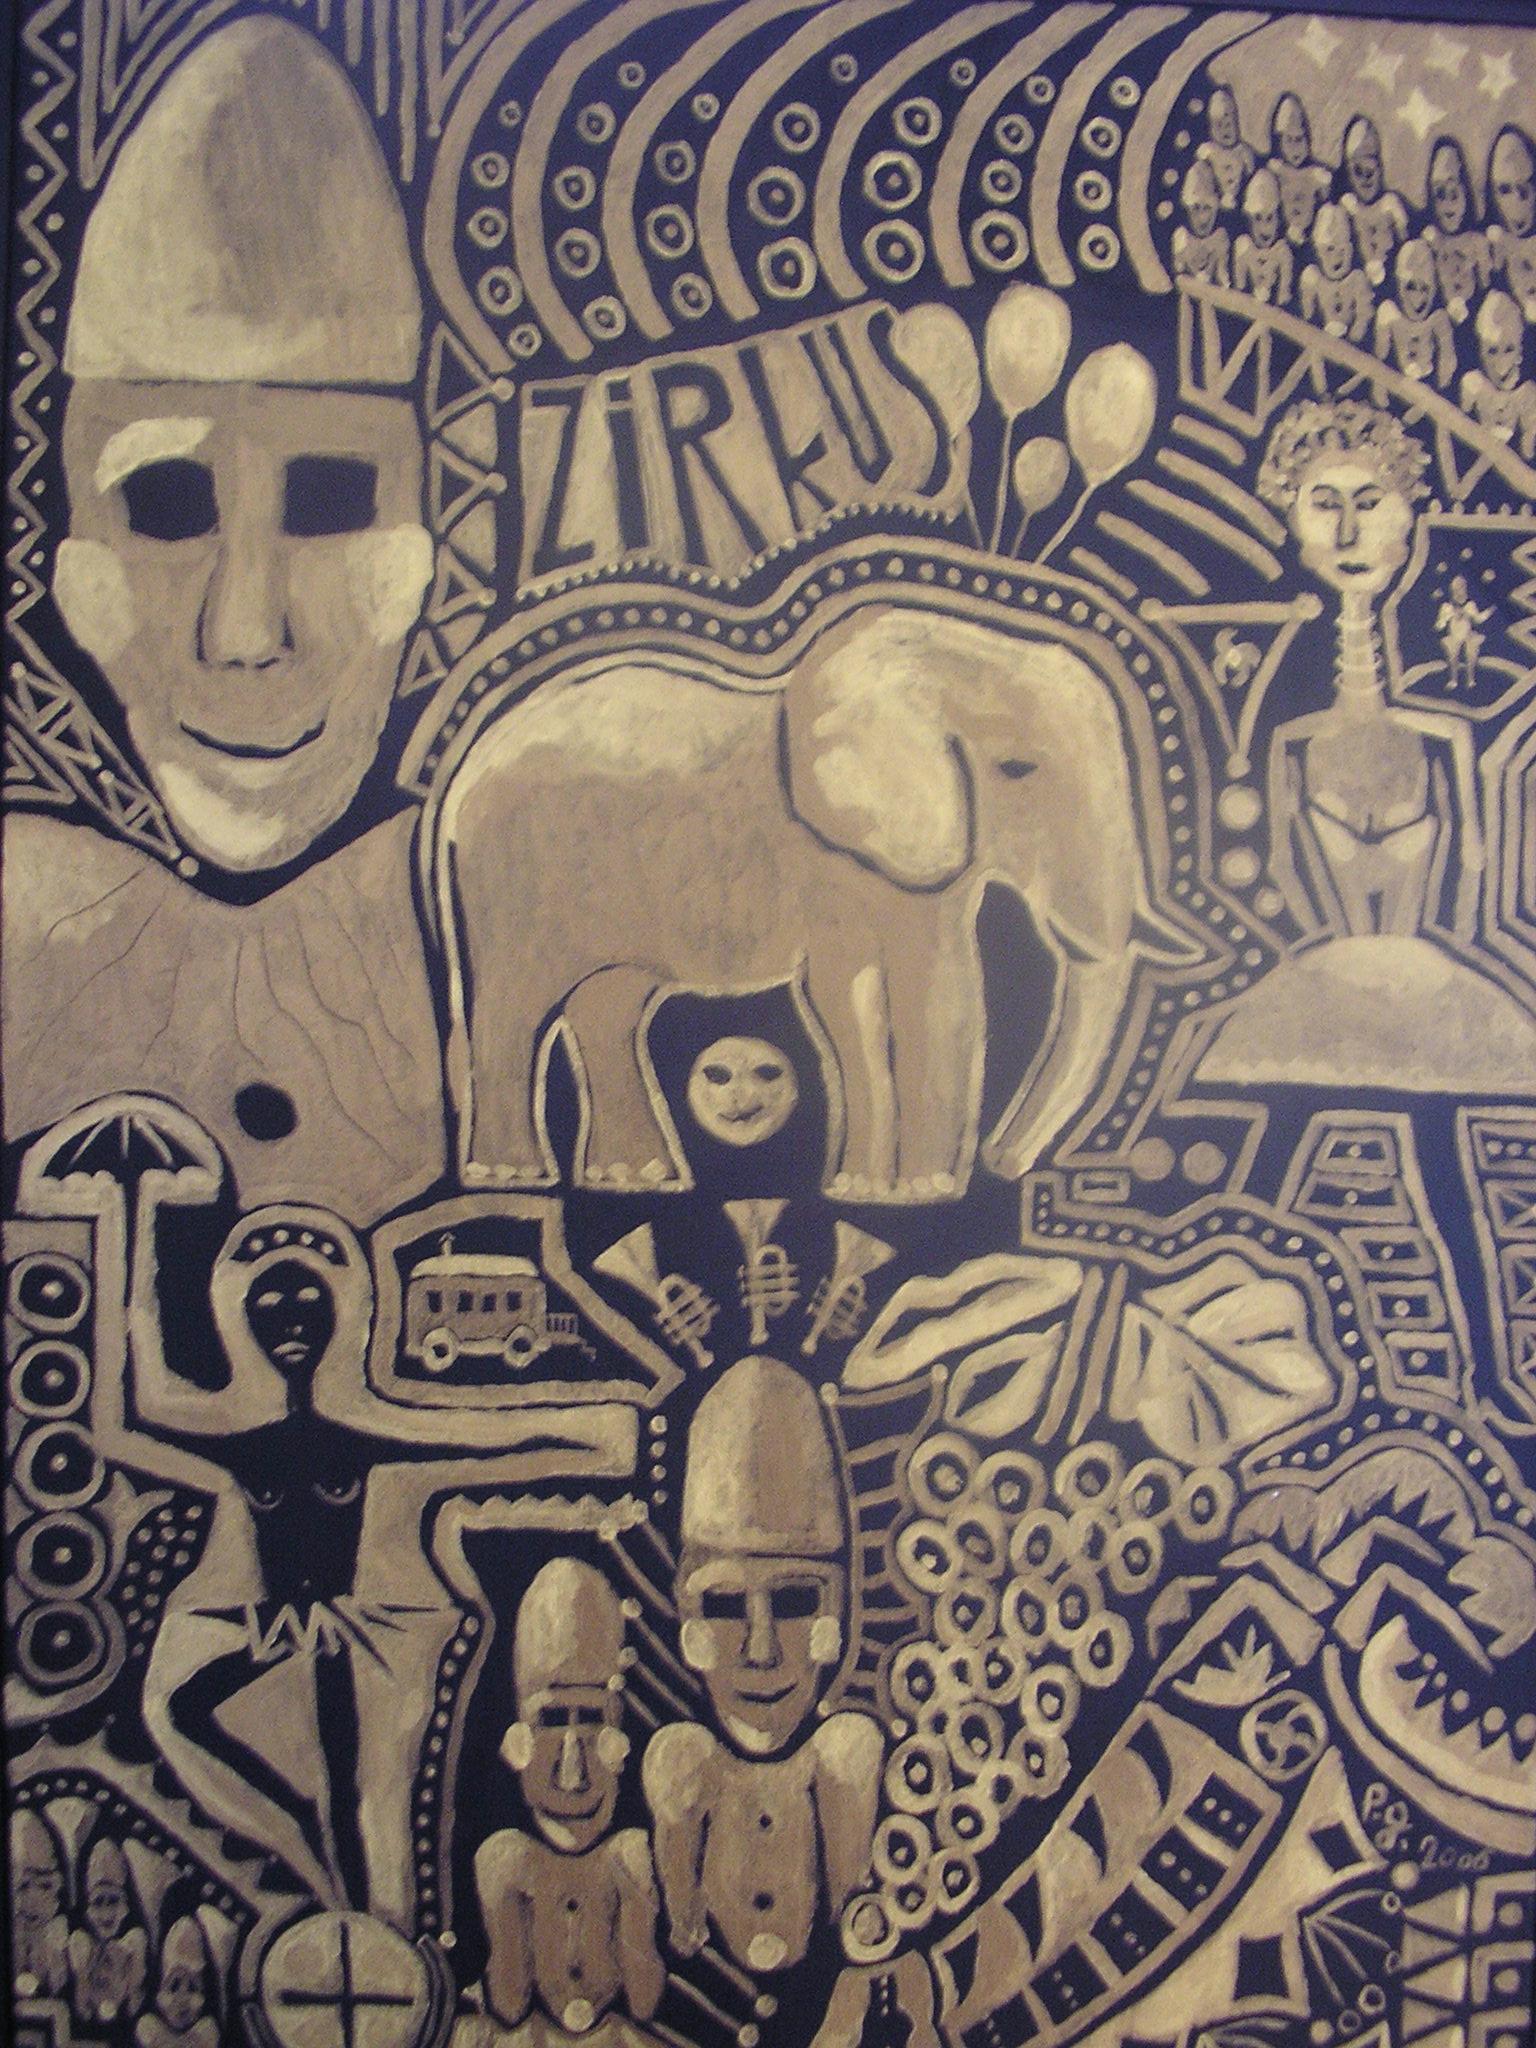 """Zirkus"" - 2004 - p.g. - [patrick gourgouillat]"